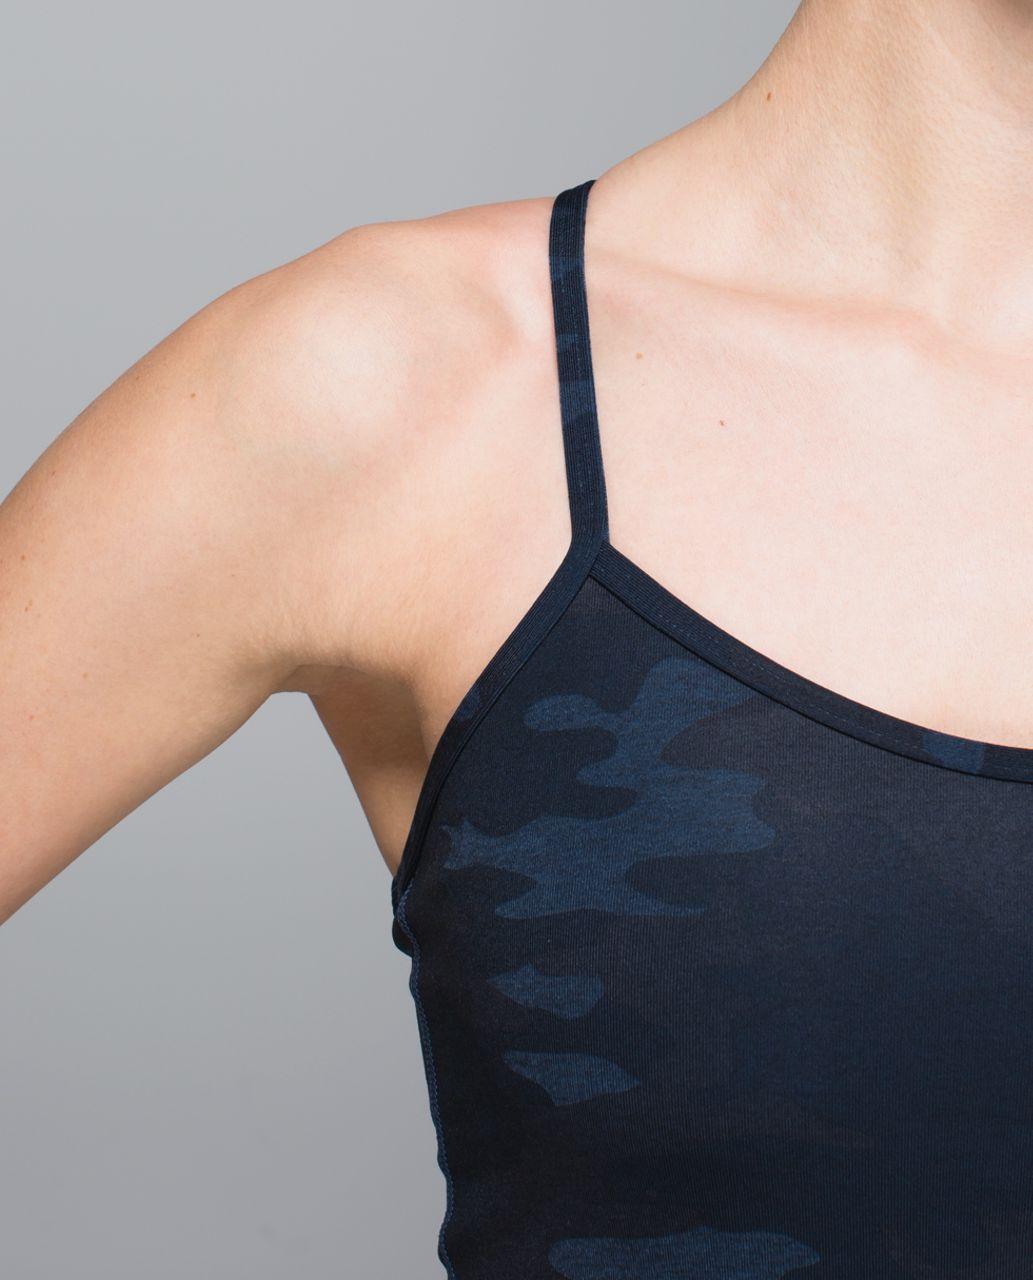 Lululemon Power Y Tank *Luon - Heathered Texture Lotus Camo Oil Slick Blue